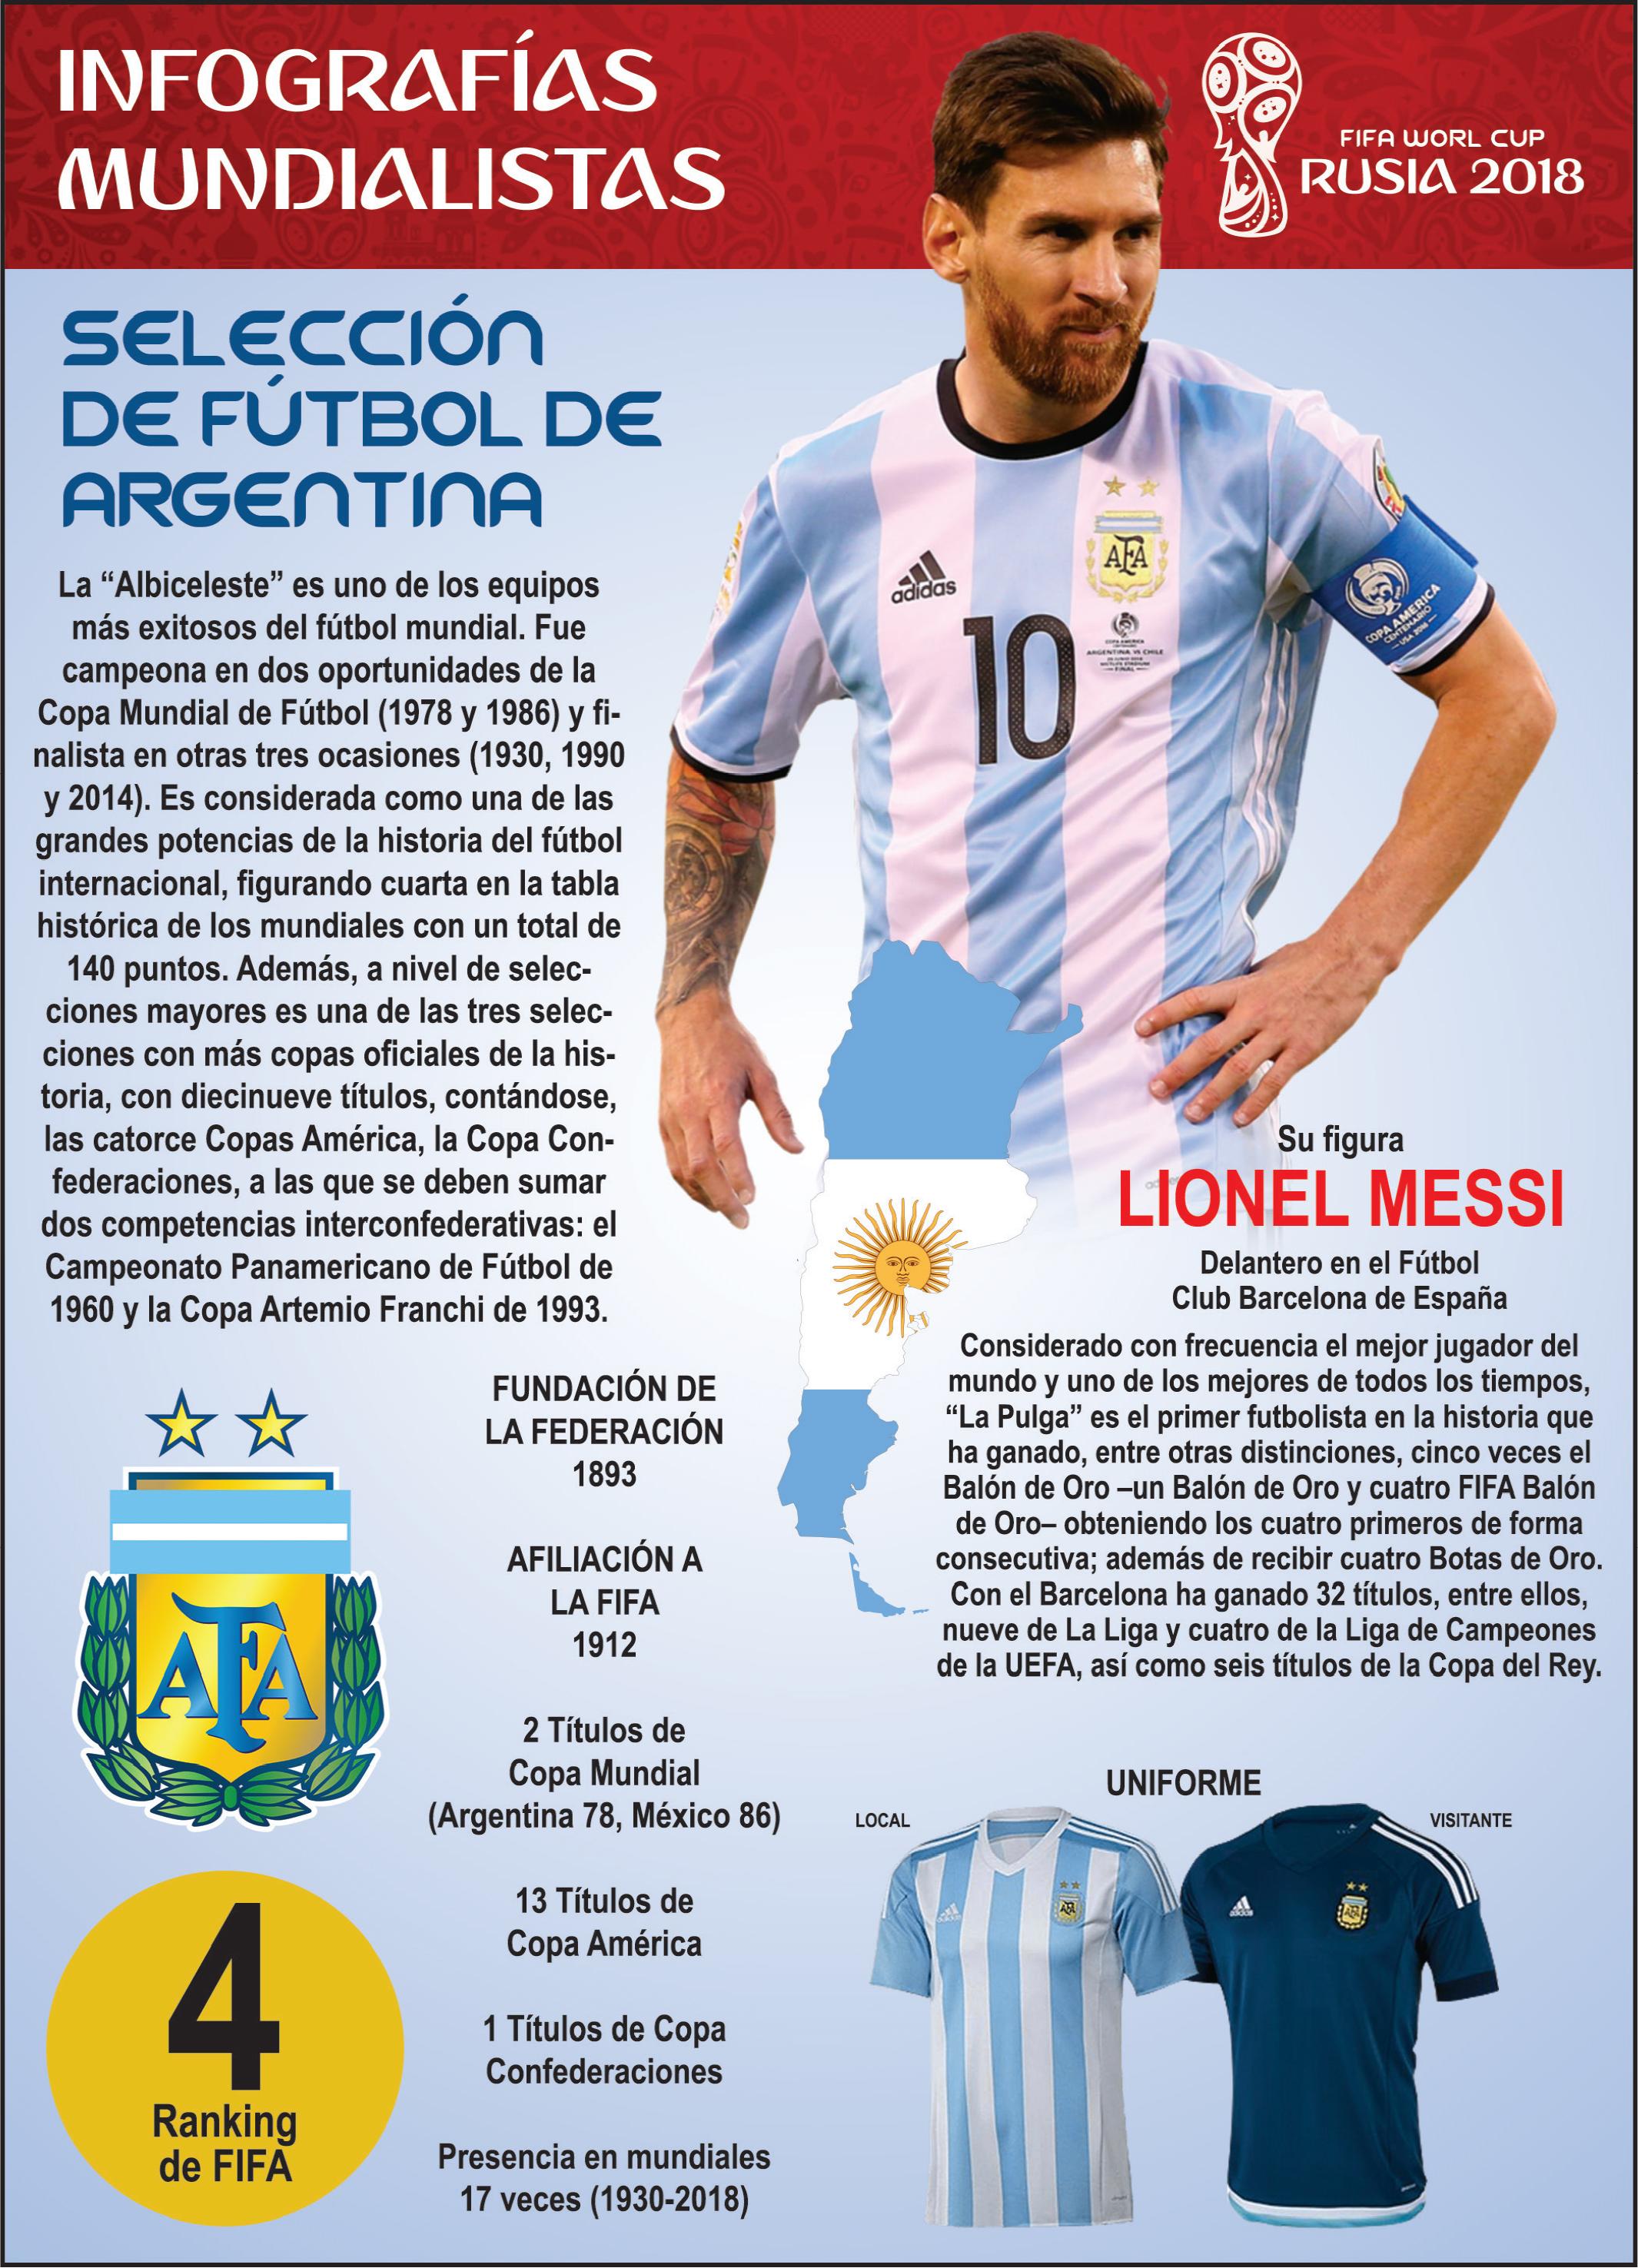 Seleccion de futbol de argentina.jpg